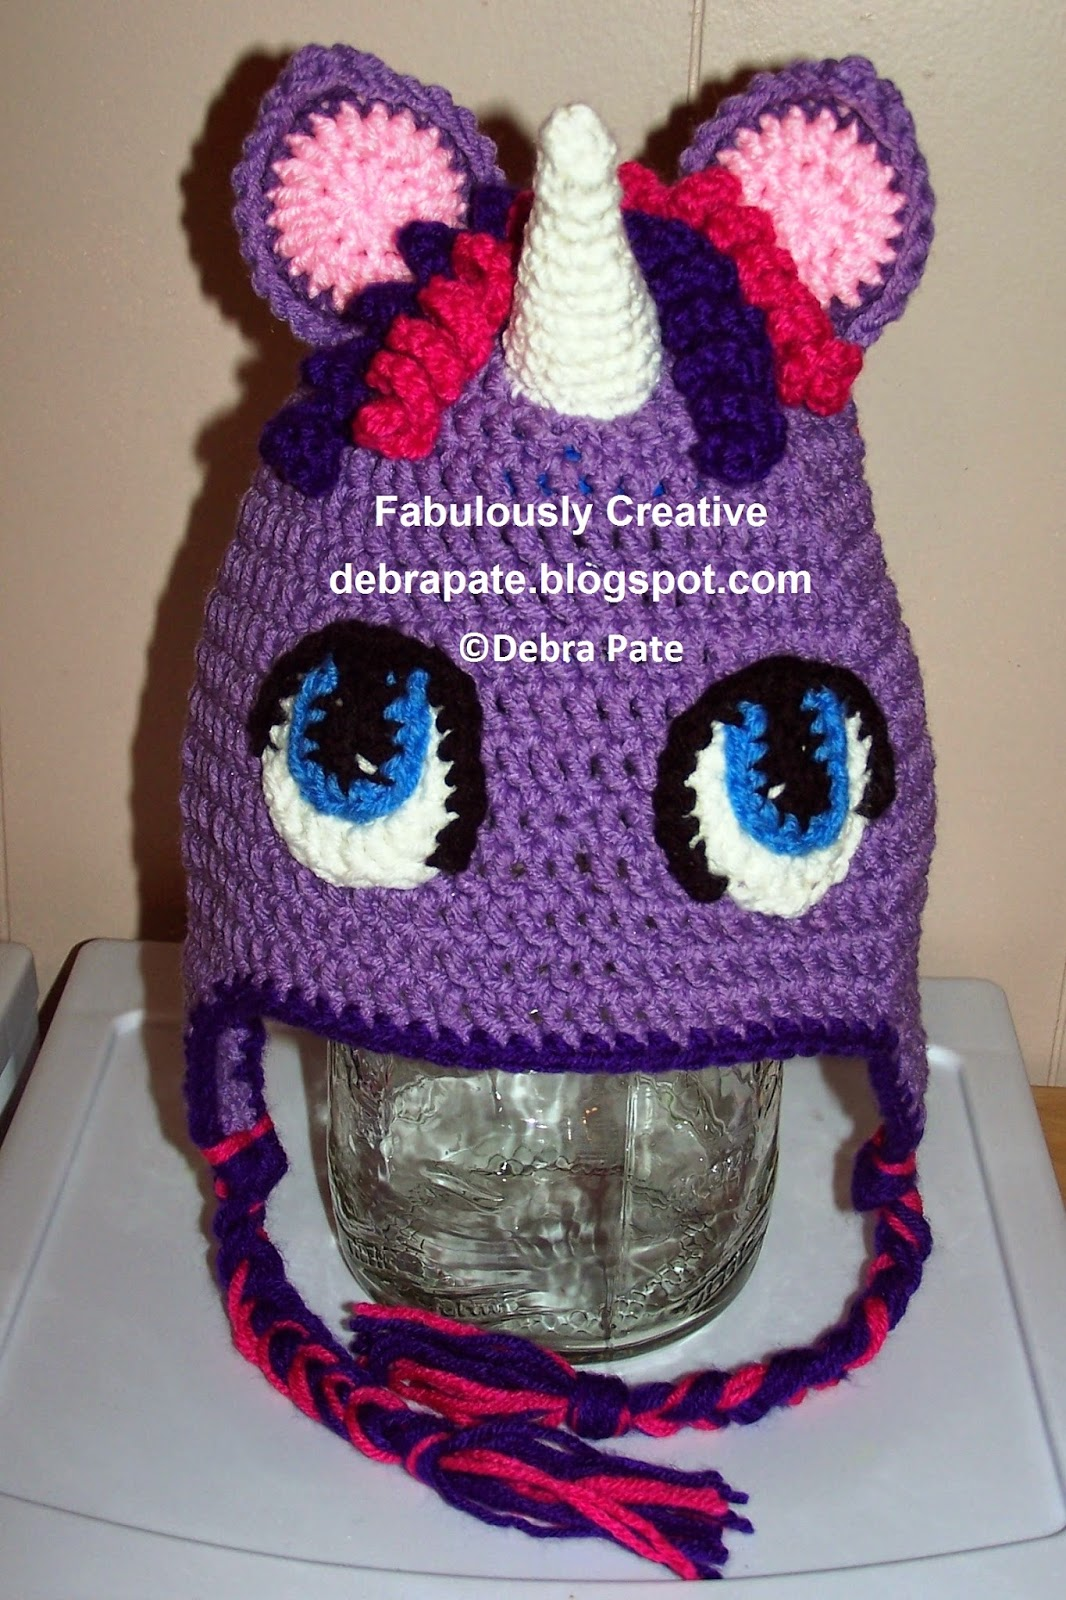 Fabulously Creative My Little Pony Twilight Sparkle Crochet Hat